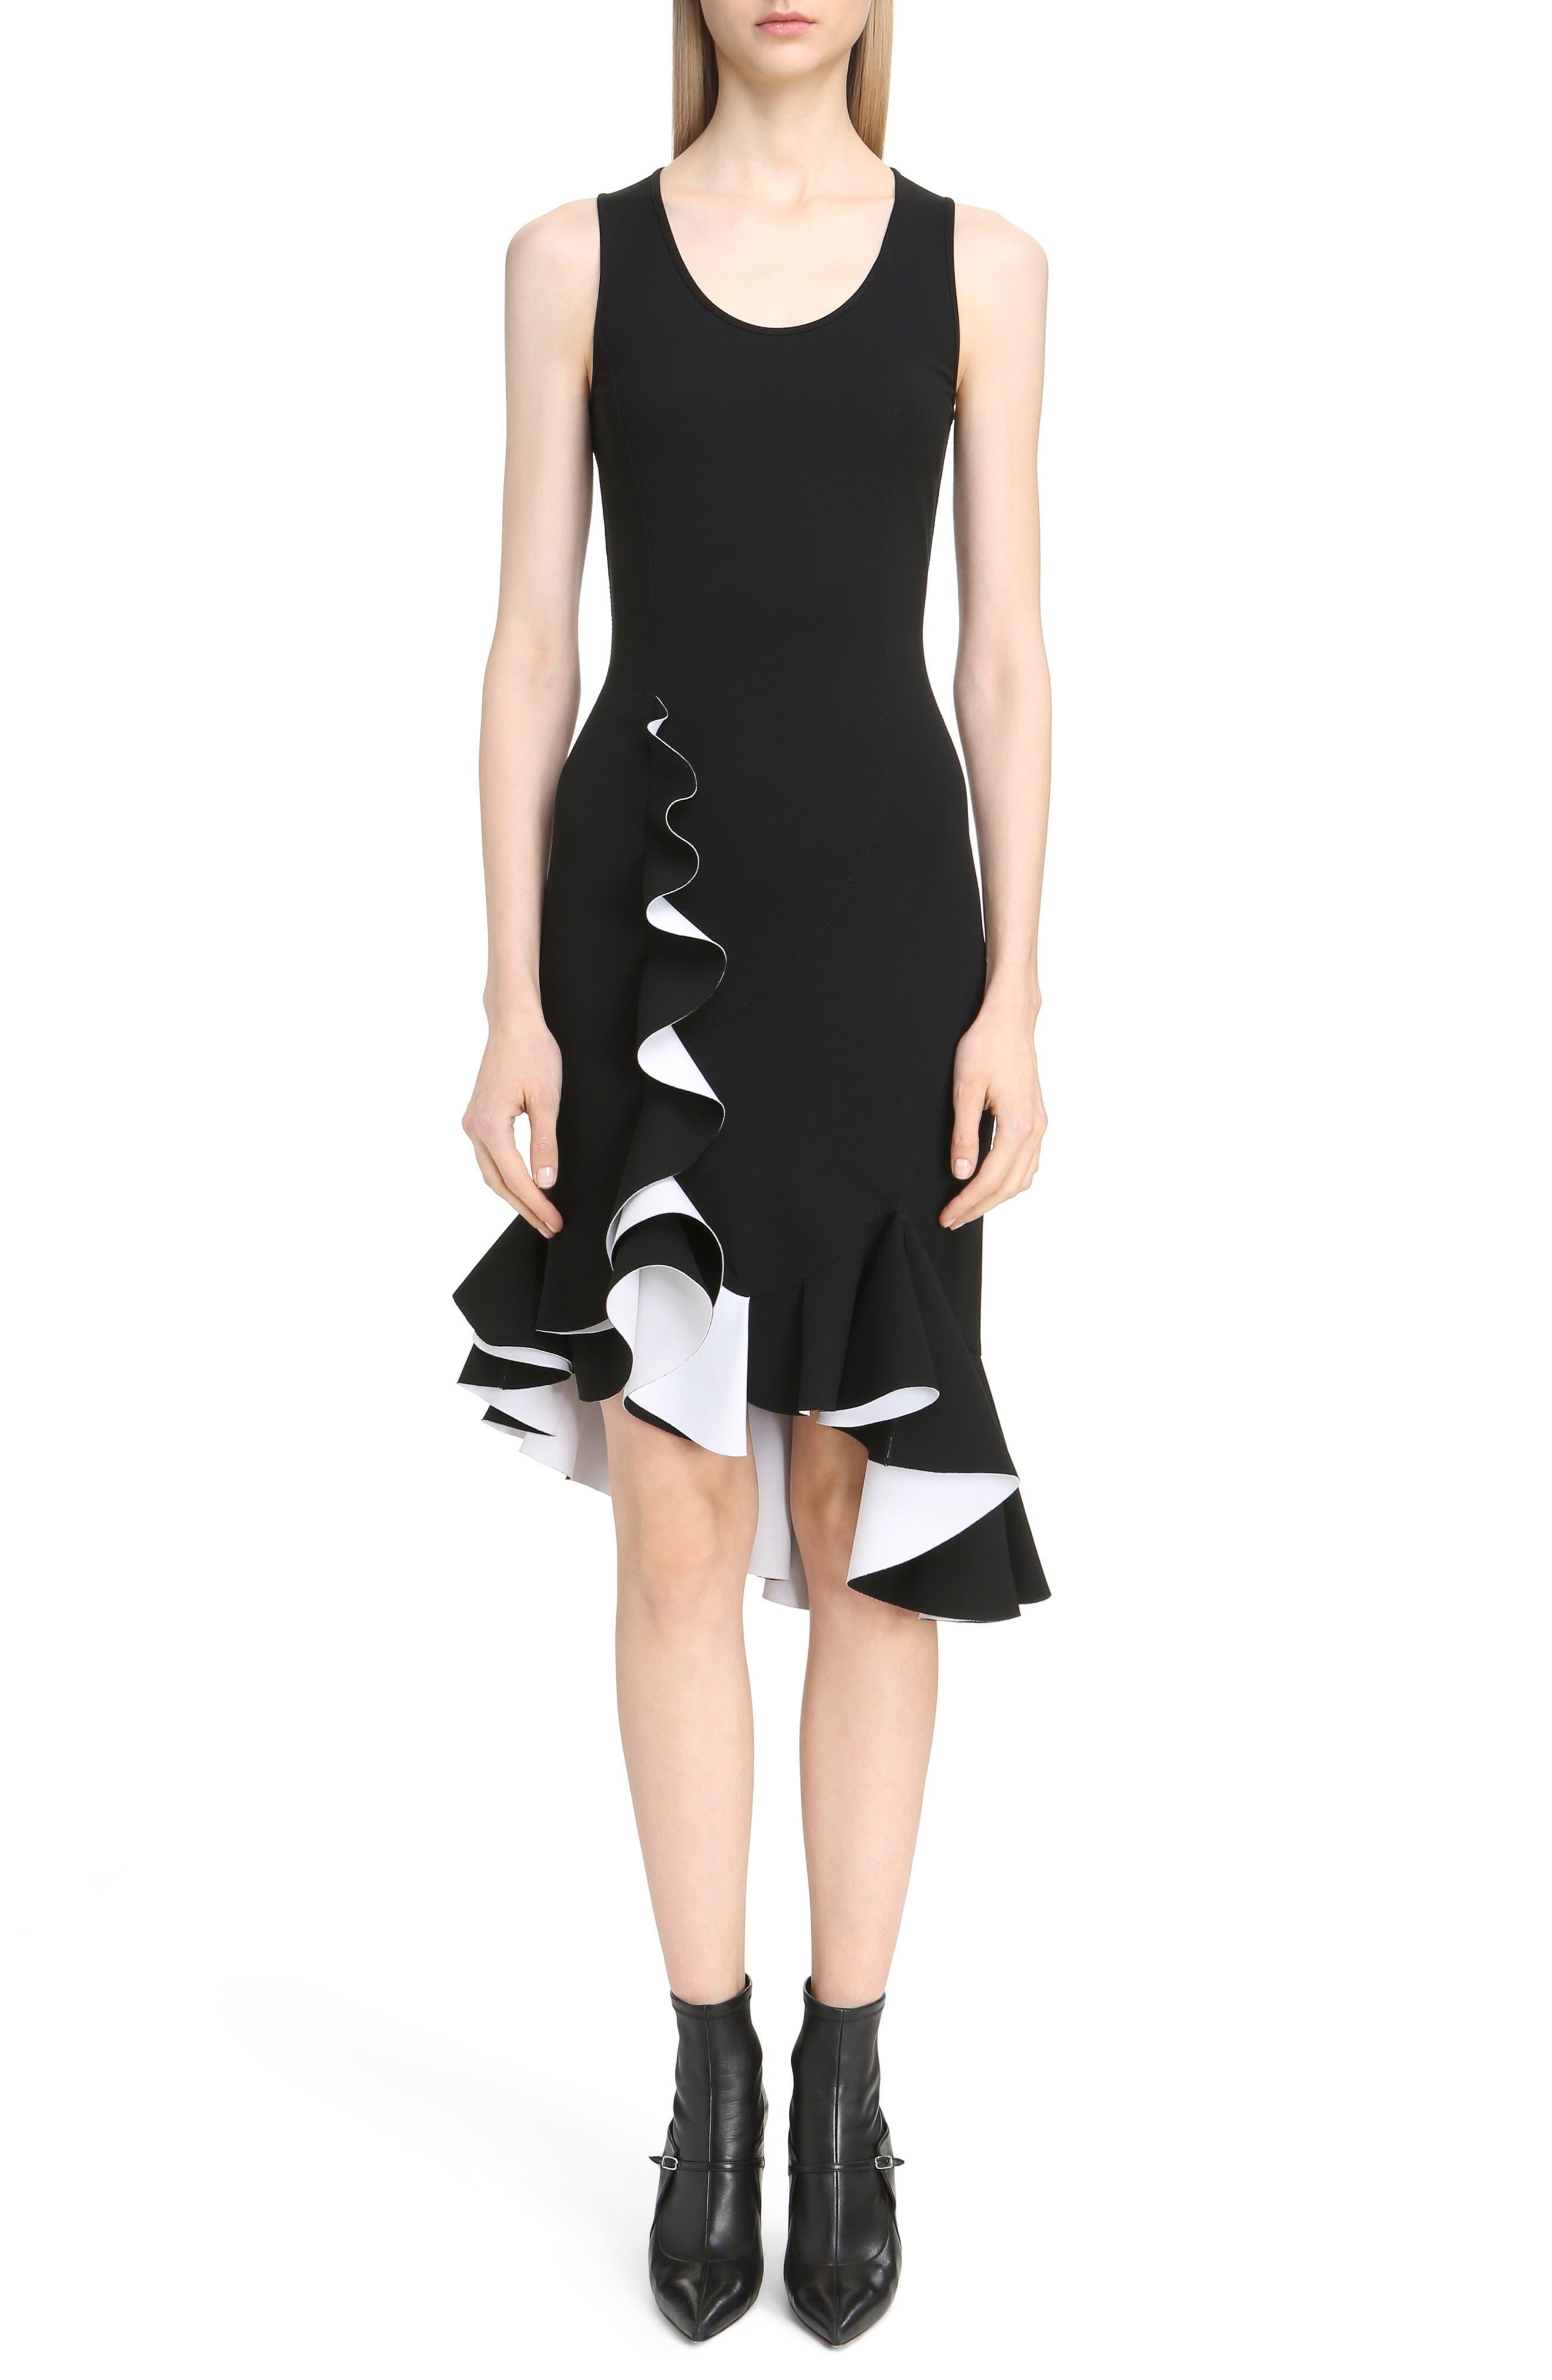 Givenchy Bicolor Ruffle Crepe Dress